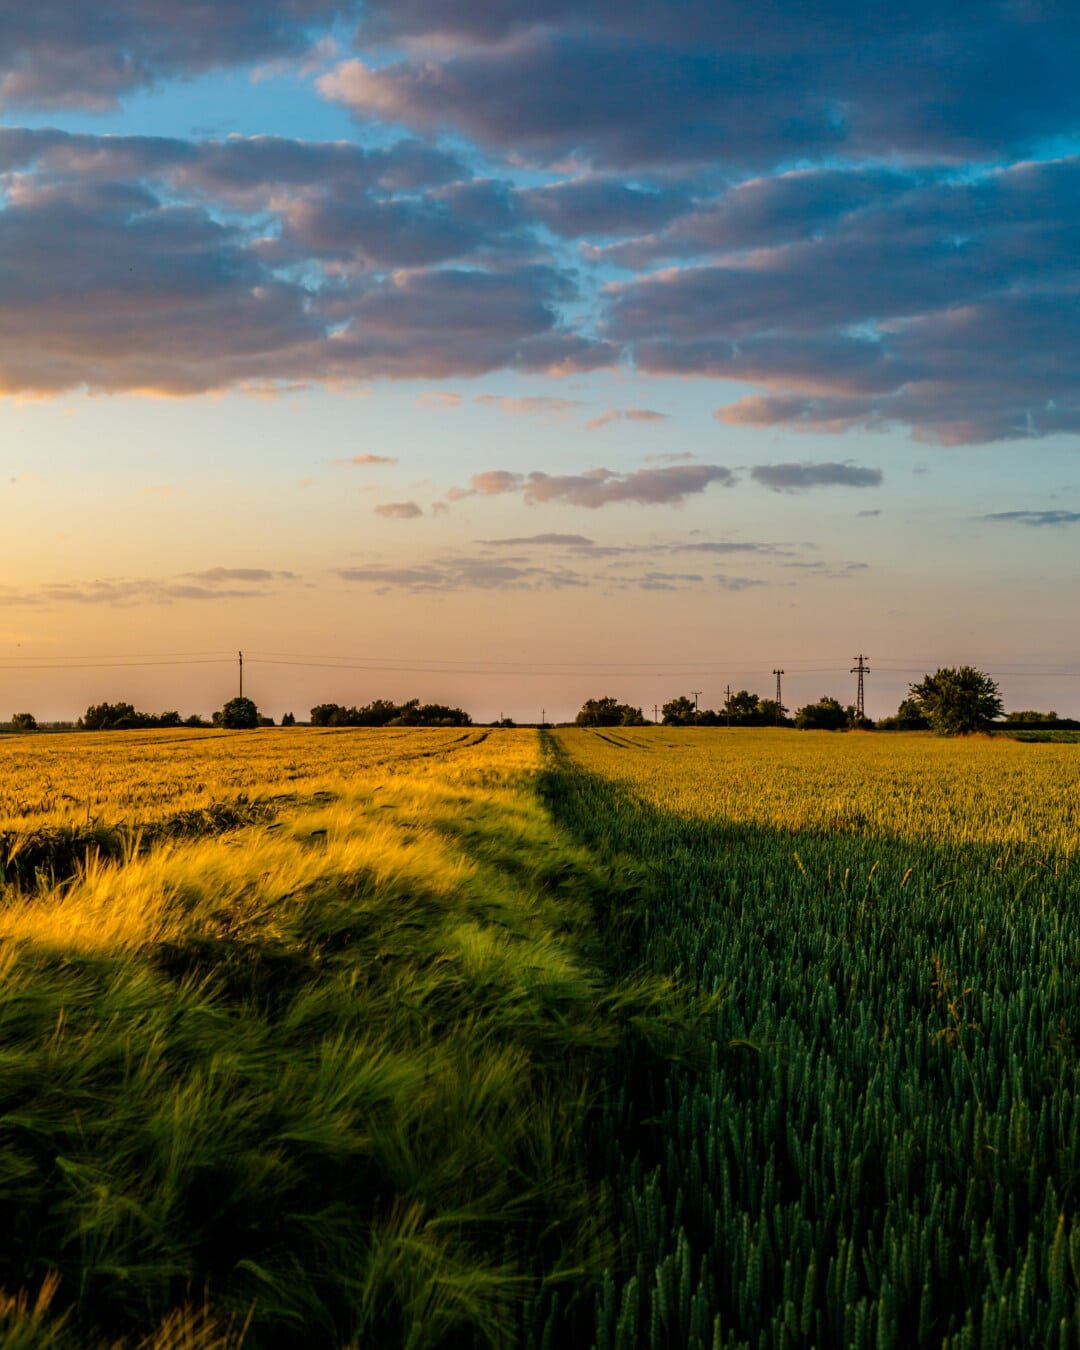 wheatfield, barley, idyllic, dusk, dark blue, clouds, seed, landscape, meadow, farm